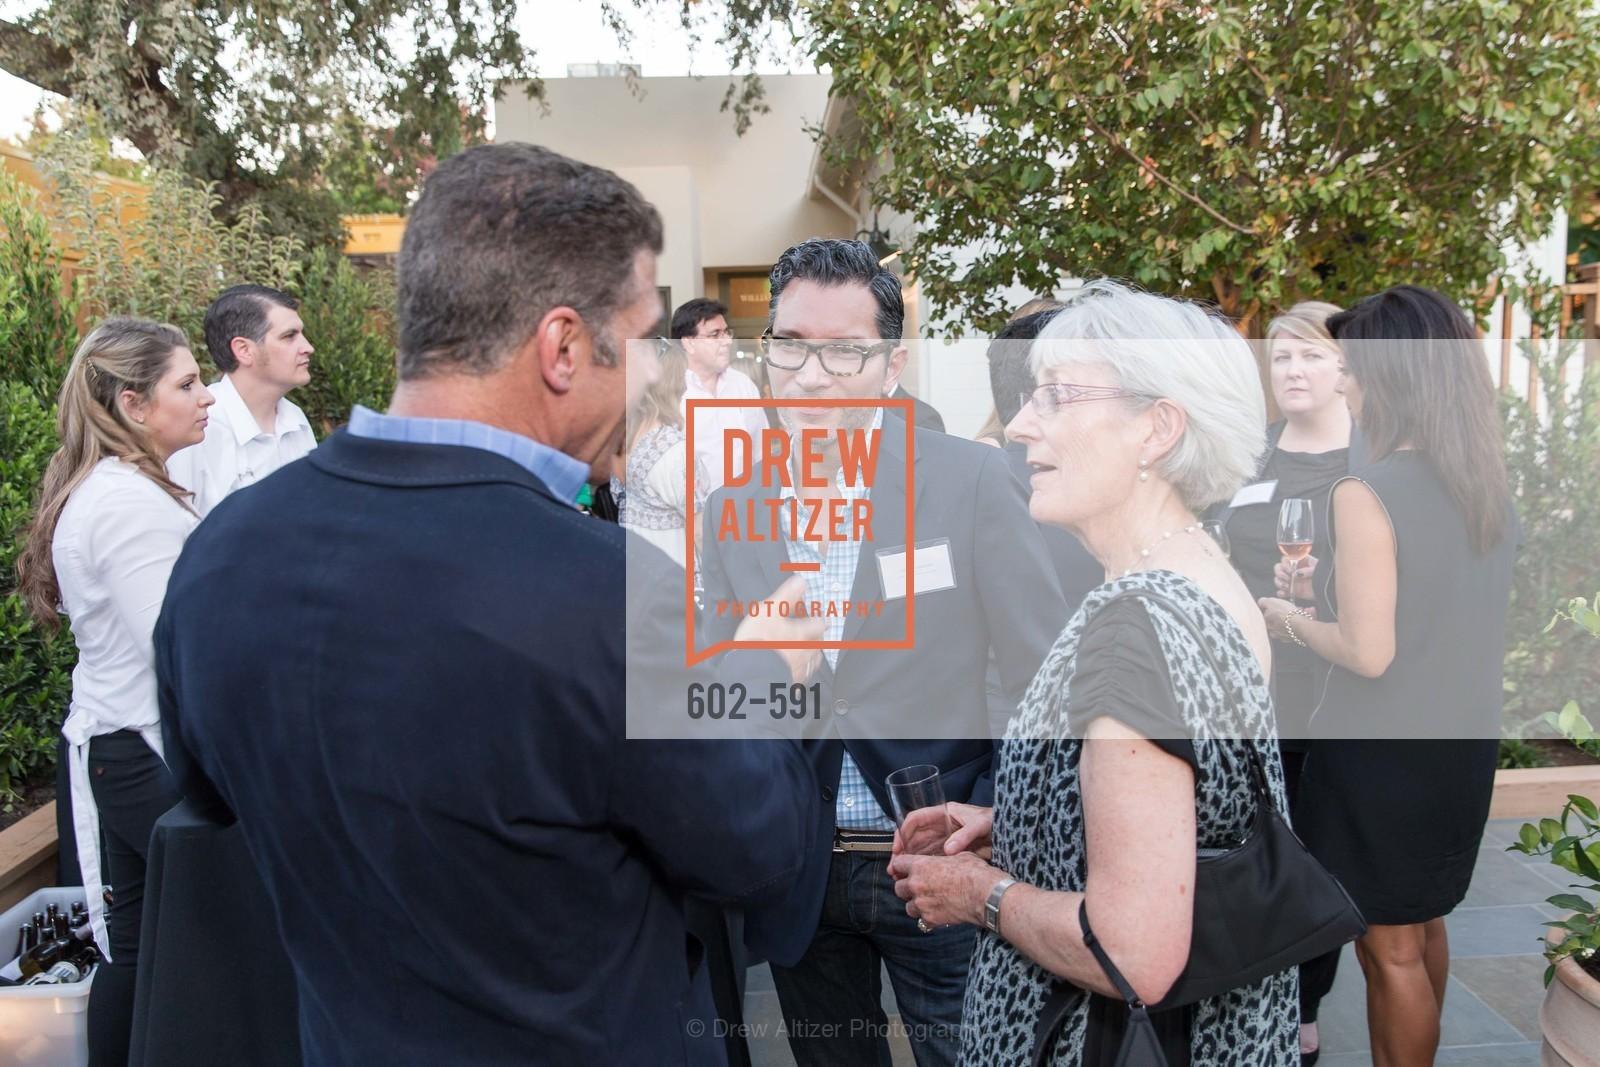 David Jimenez, CHUCK WILLIAMS Birthday Celebration, US, October 2nd, 2014,Drew Altizer, Drew Altizer Photography, full-service agency, private events, San Francisco photographer, photographer california